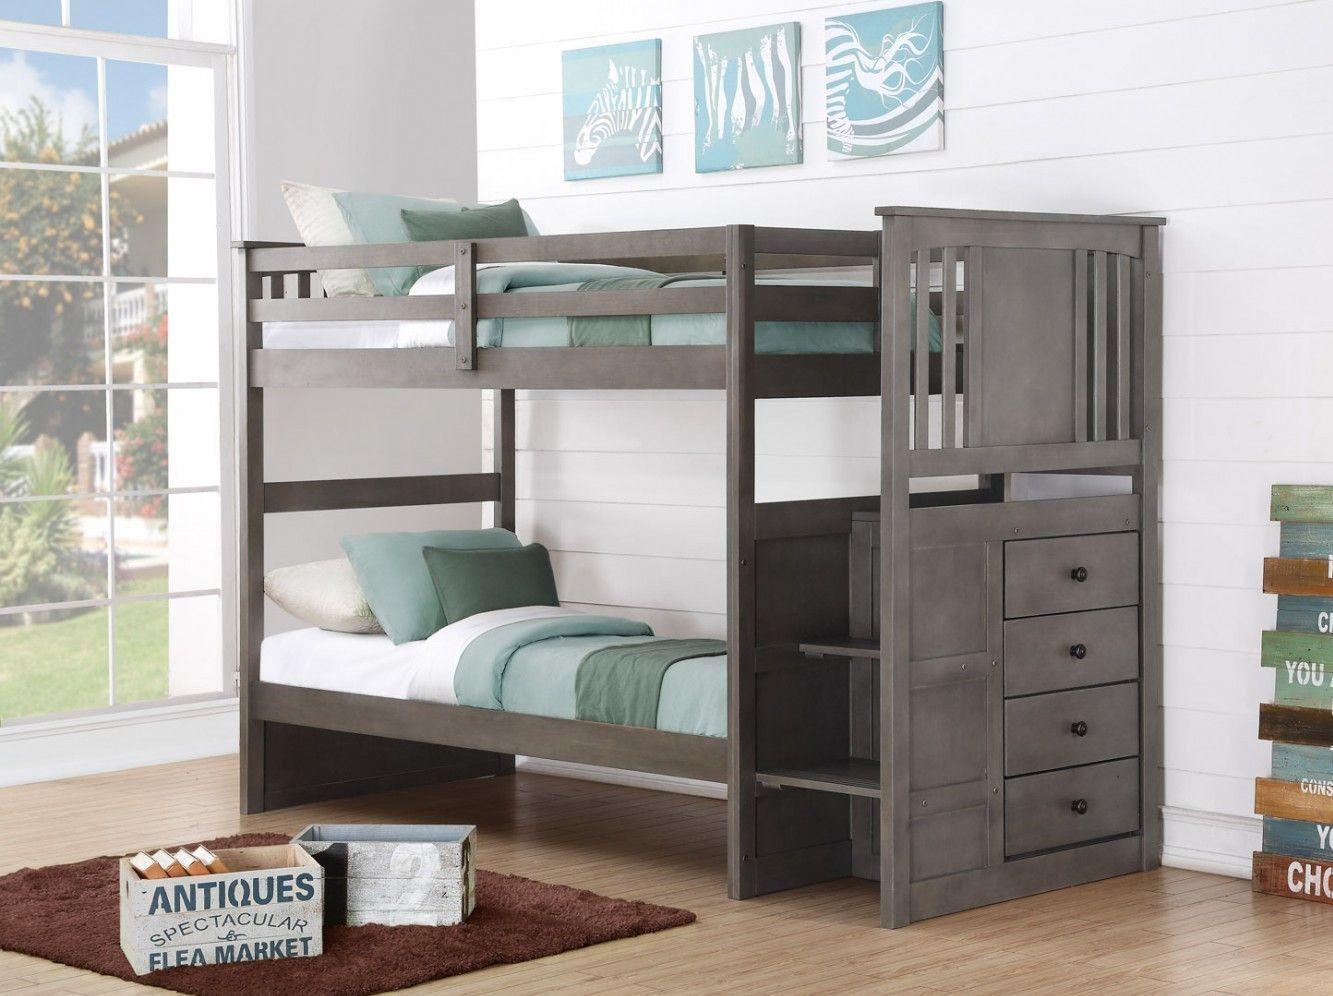 Etagenbett Derby : 50 boy bunk bed interior bedroom design furniture check more at